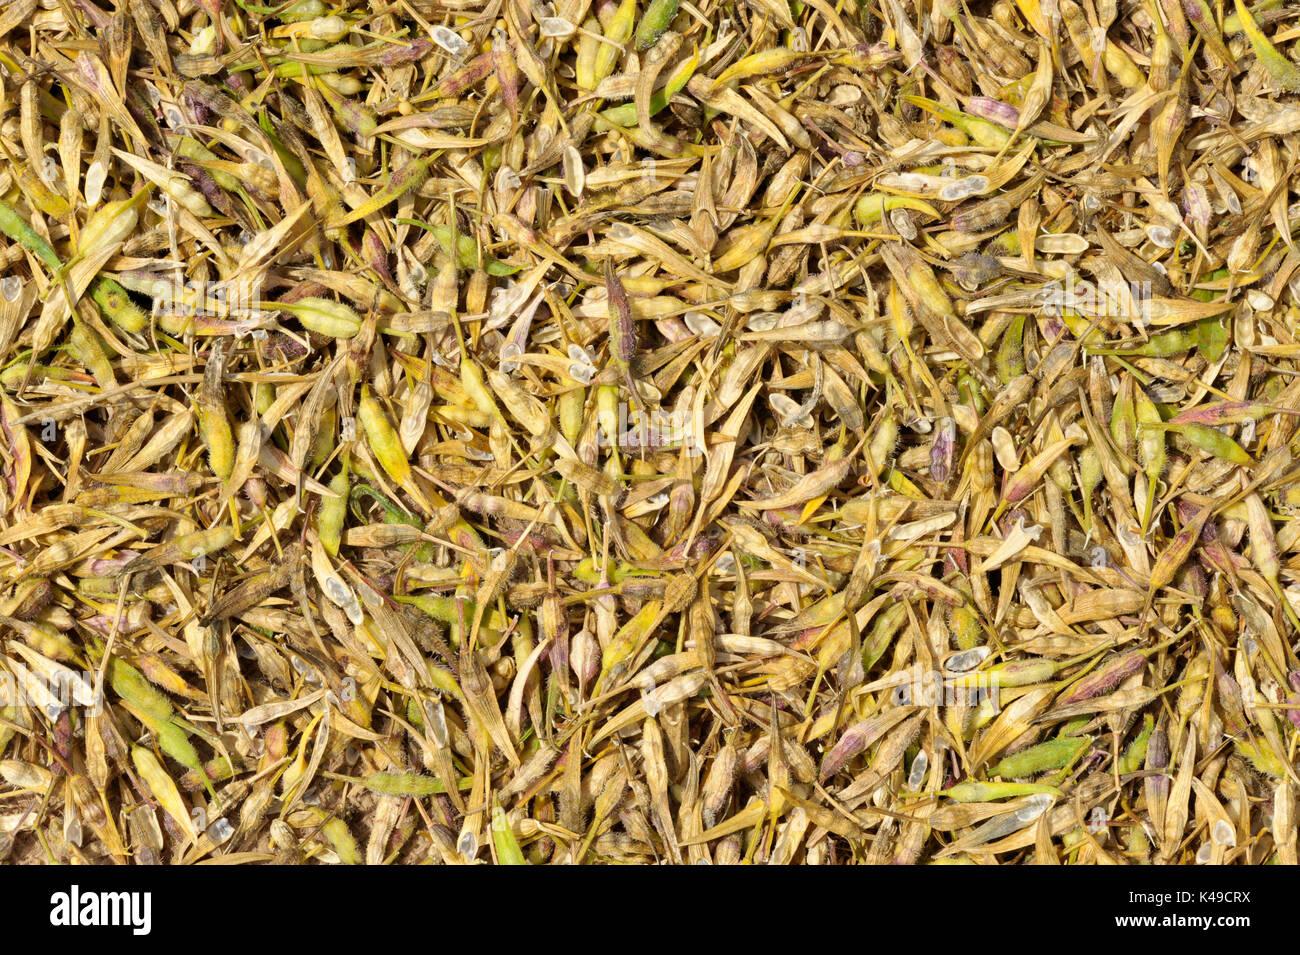 Seed saving, Yellow Mustard seed pod harvest drying also called White Mustard, Sinapis Alba, Brassica Alba or Brassica Hirta. - Stock Image